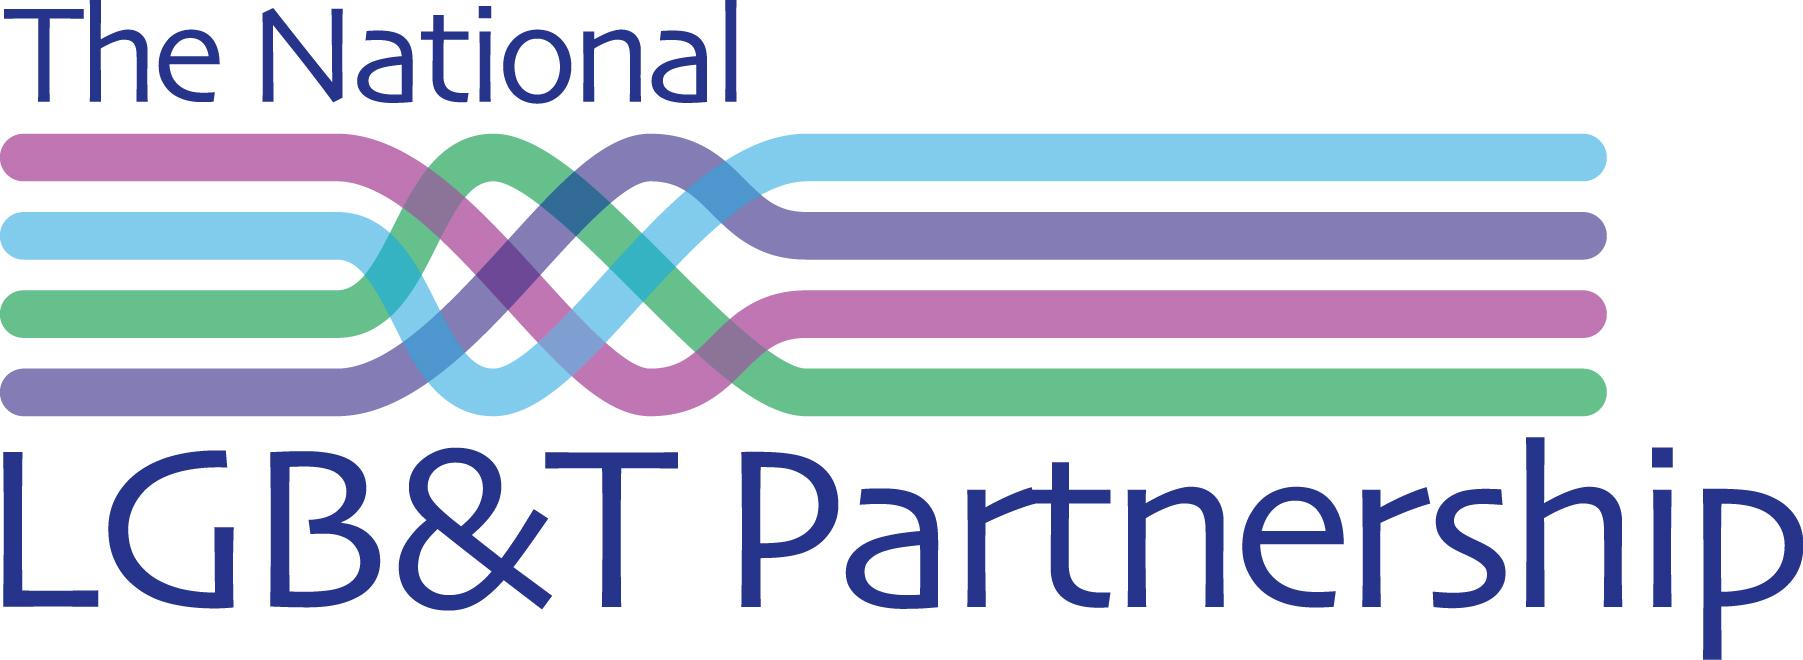 National_LGBT_Partnership-Outlined